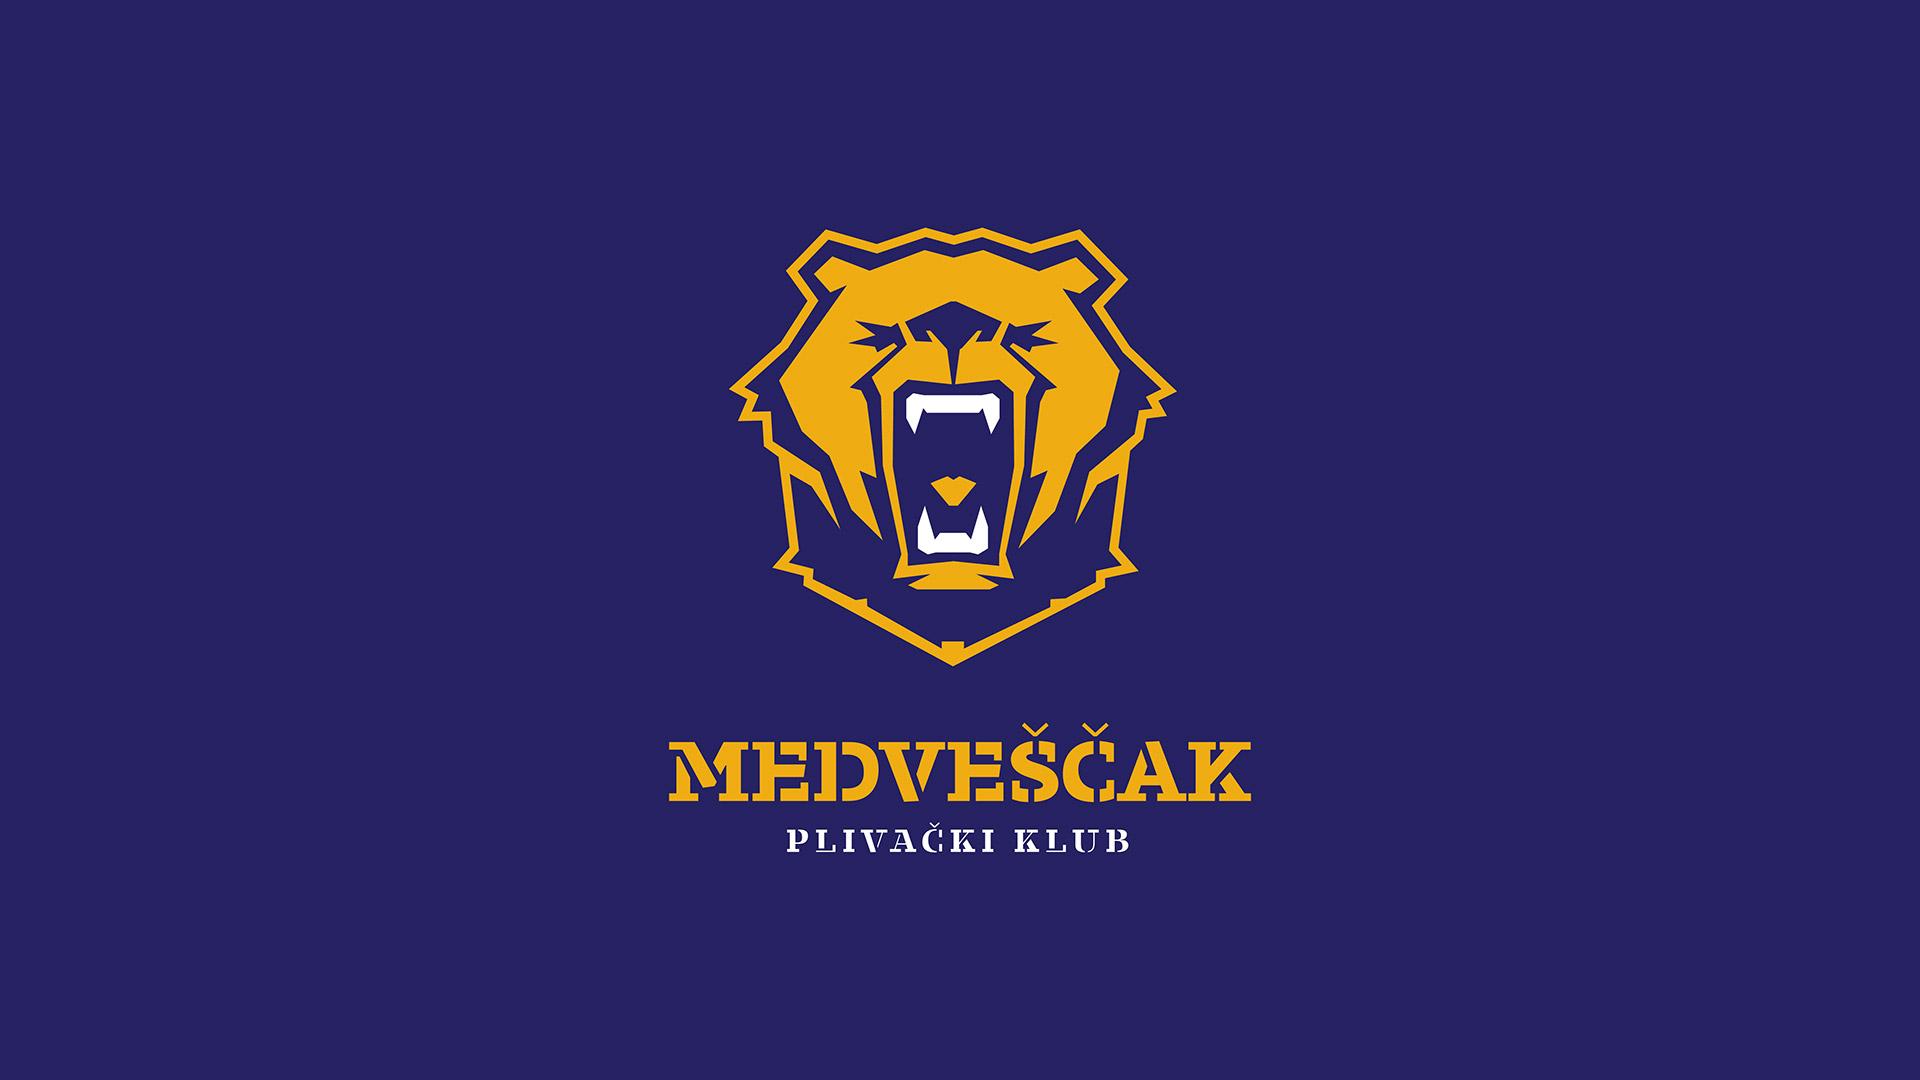 medvescak_pkm-02